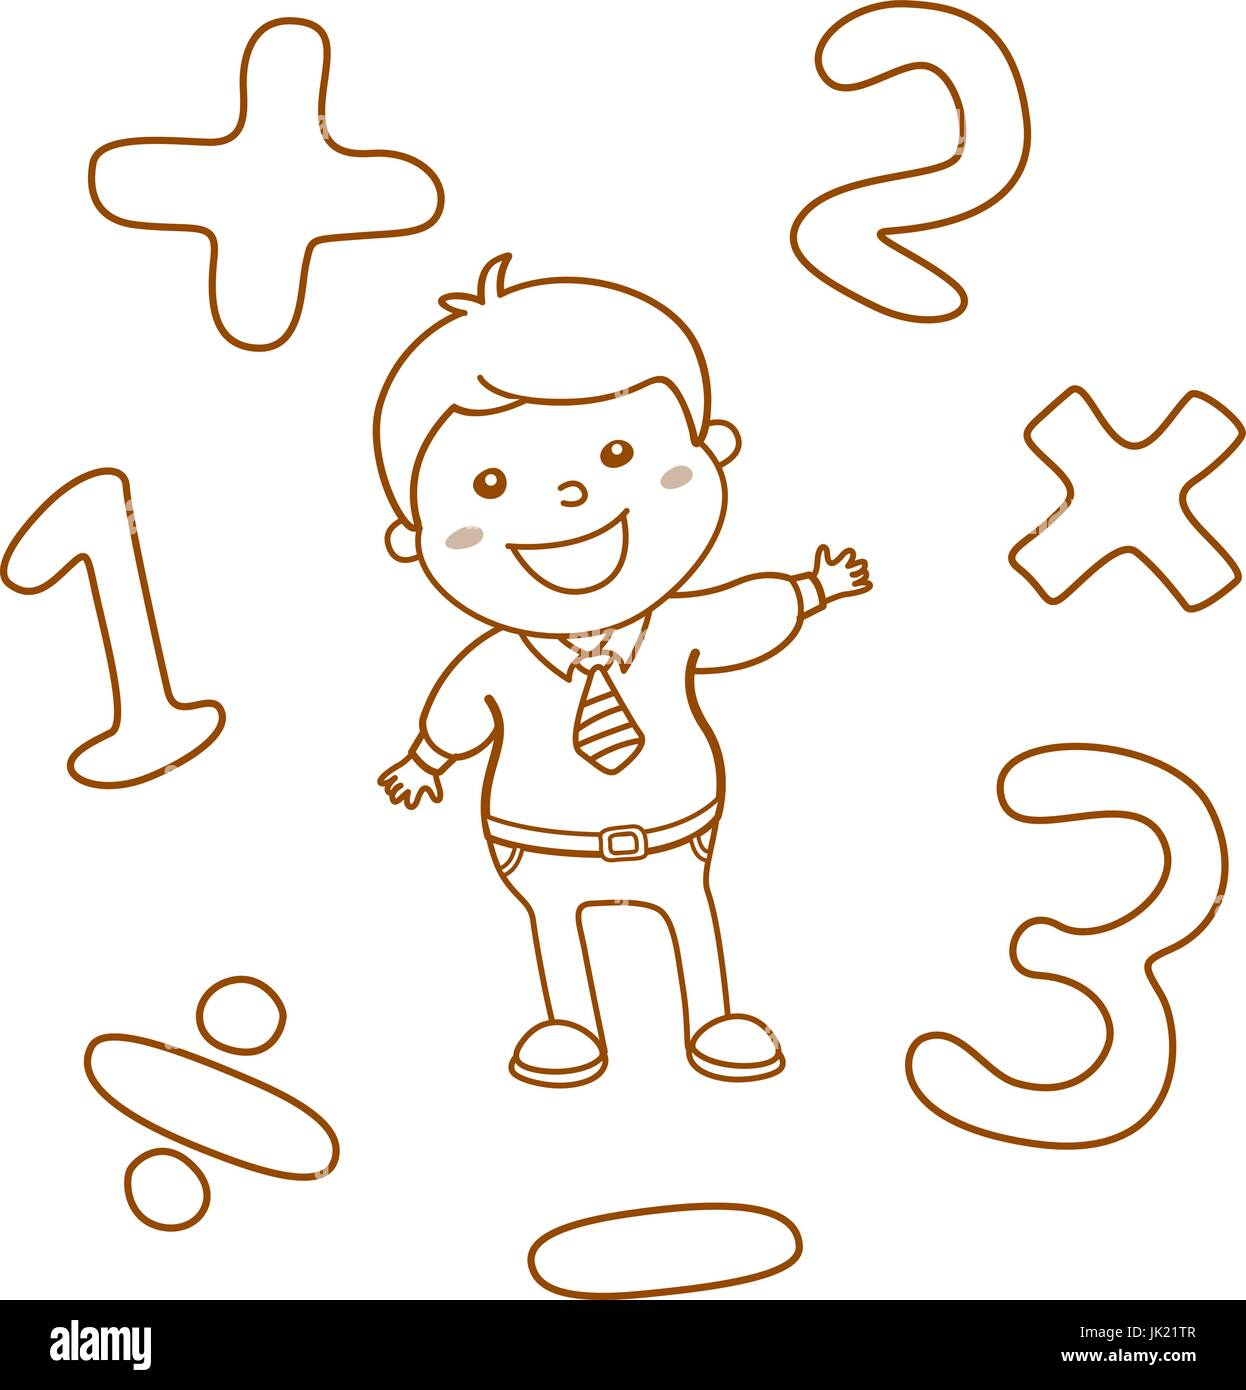 Cartoon Illustration Educational Mathematical Counting Imagenes De